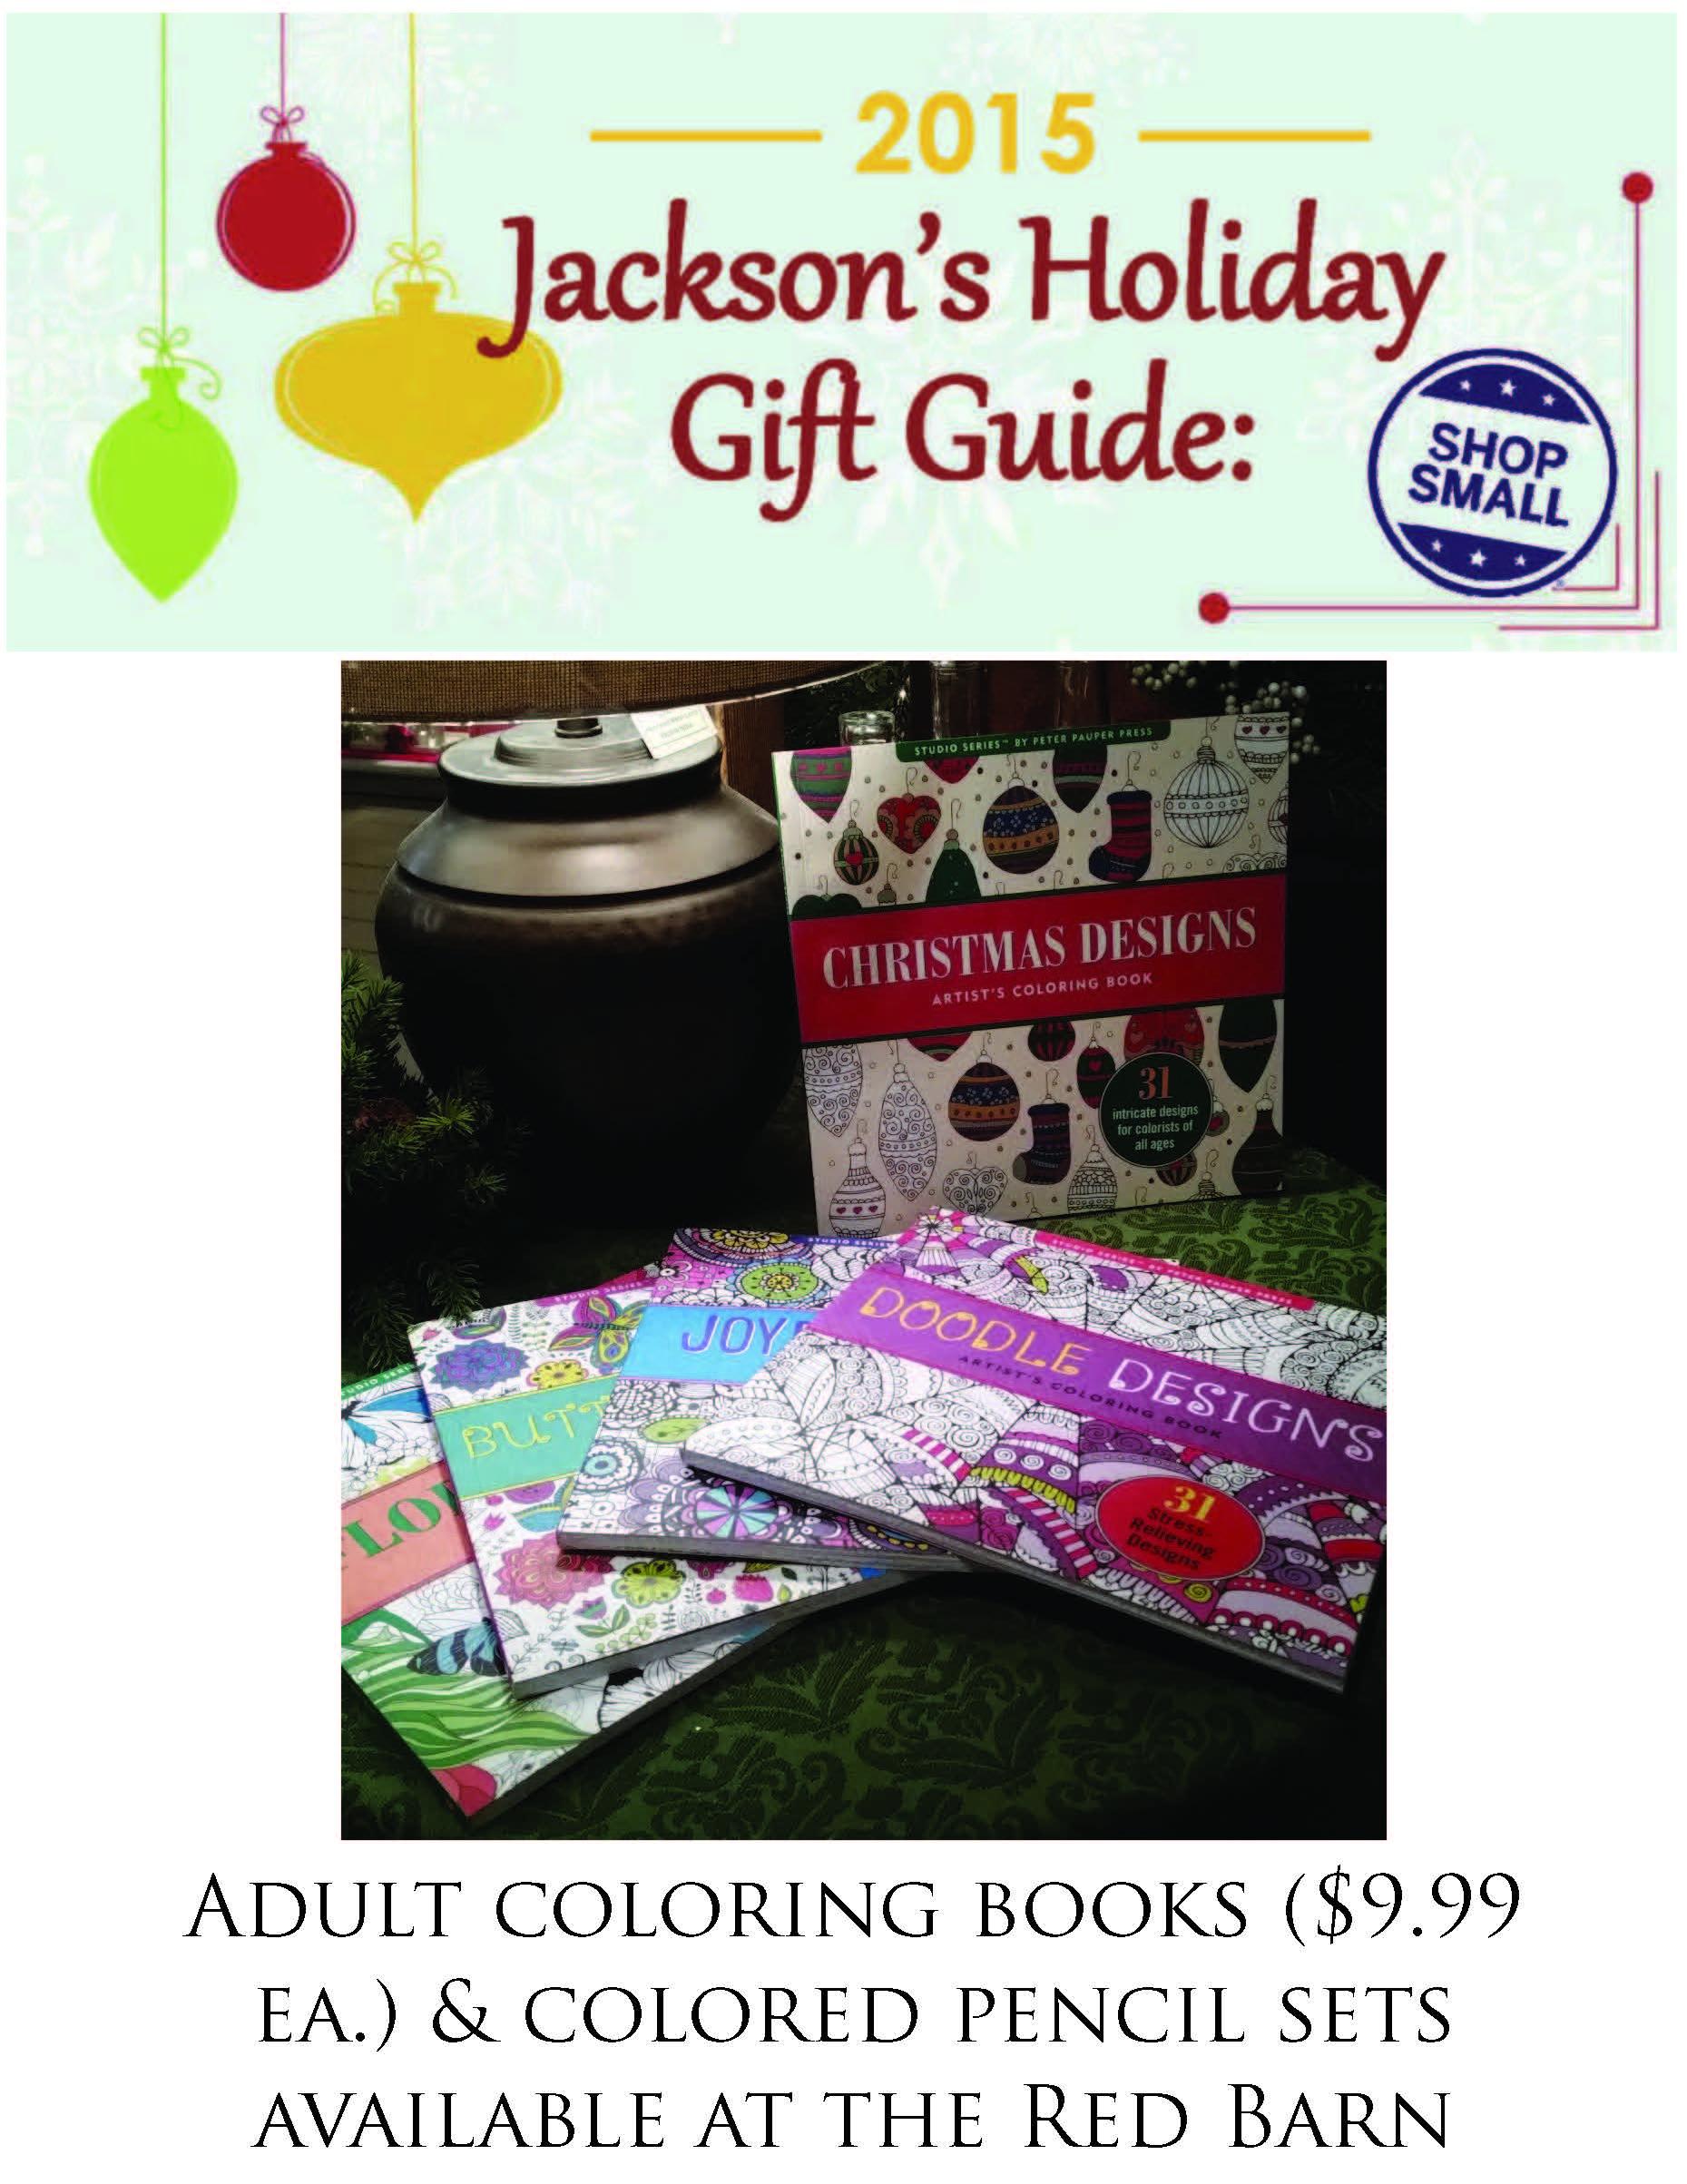 Gift_Guide_redbarn.jpg